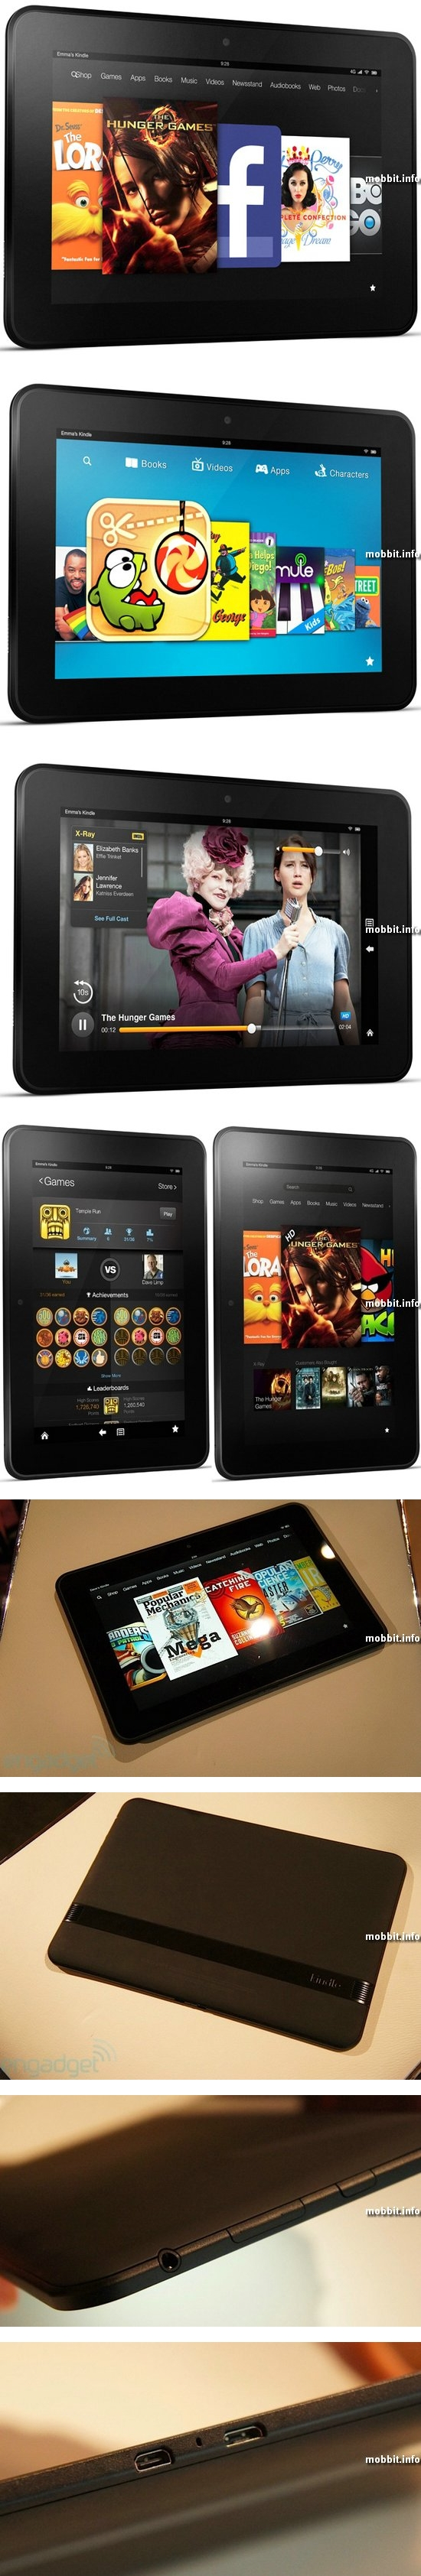 8, 9-дюймовый Kindle Fire HD